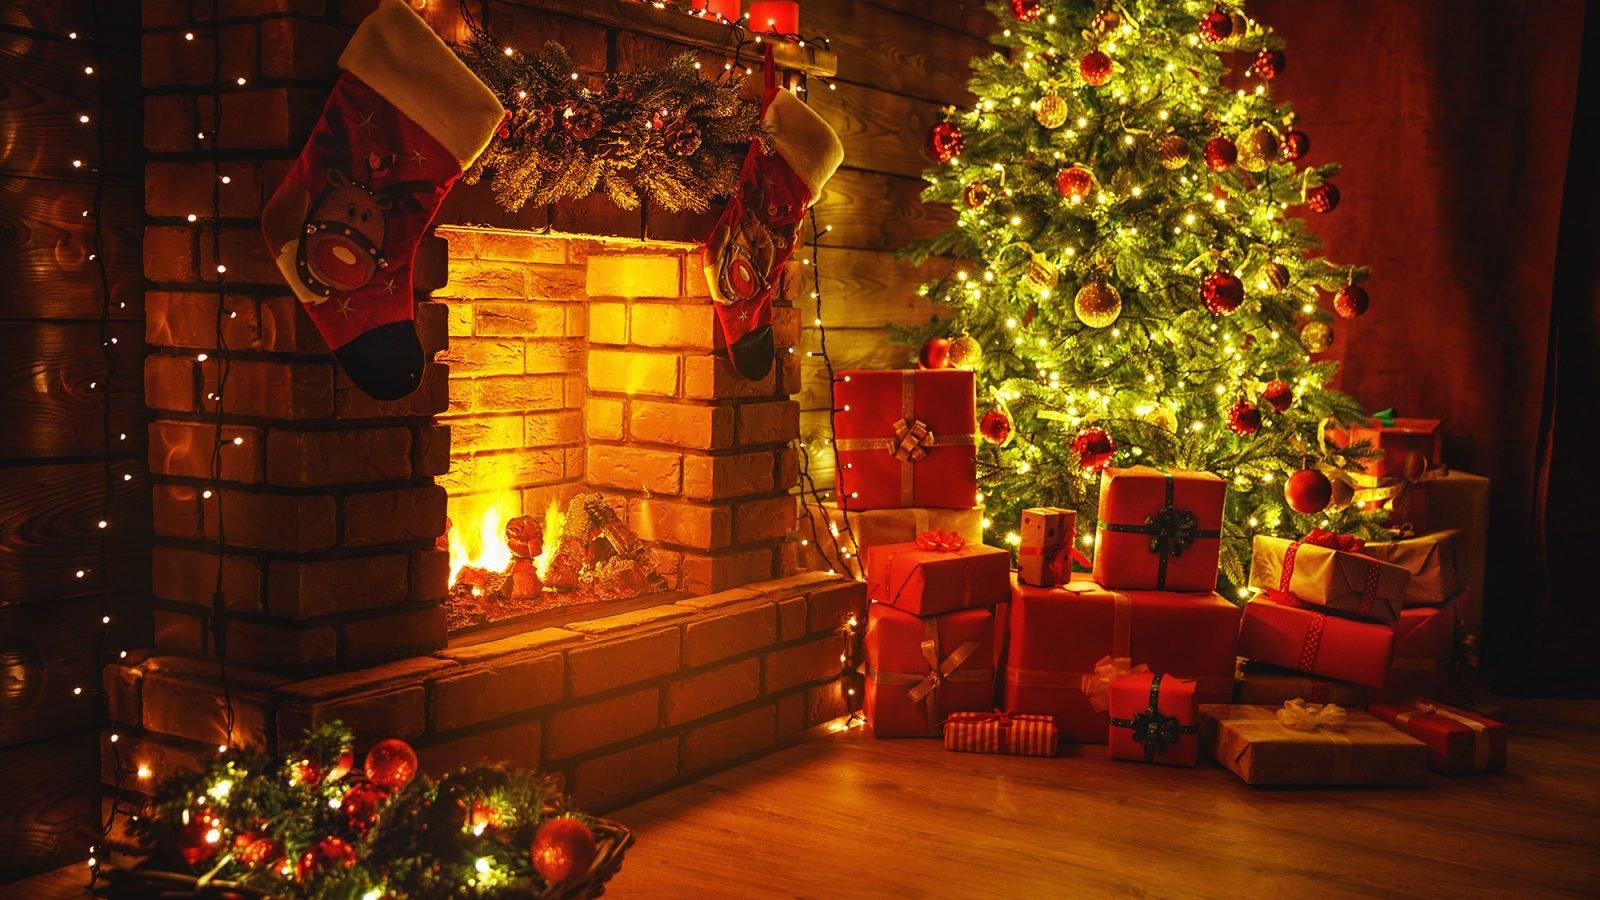 Welcome to Jacobs Christmas